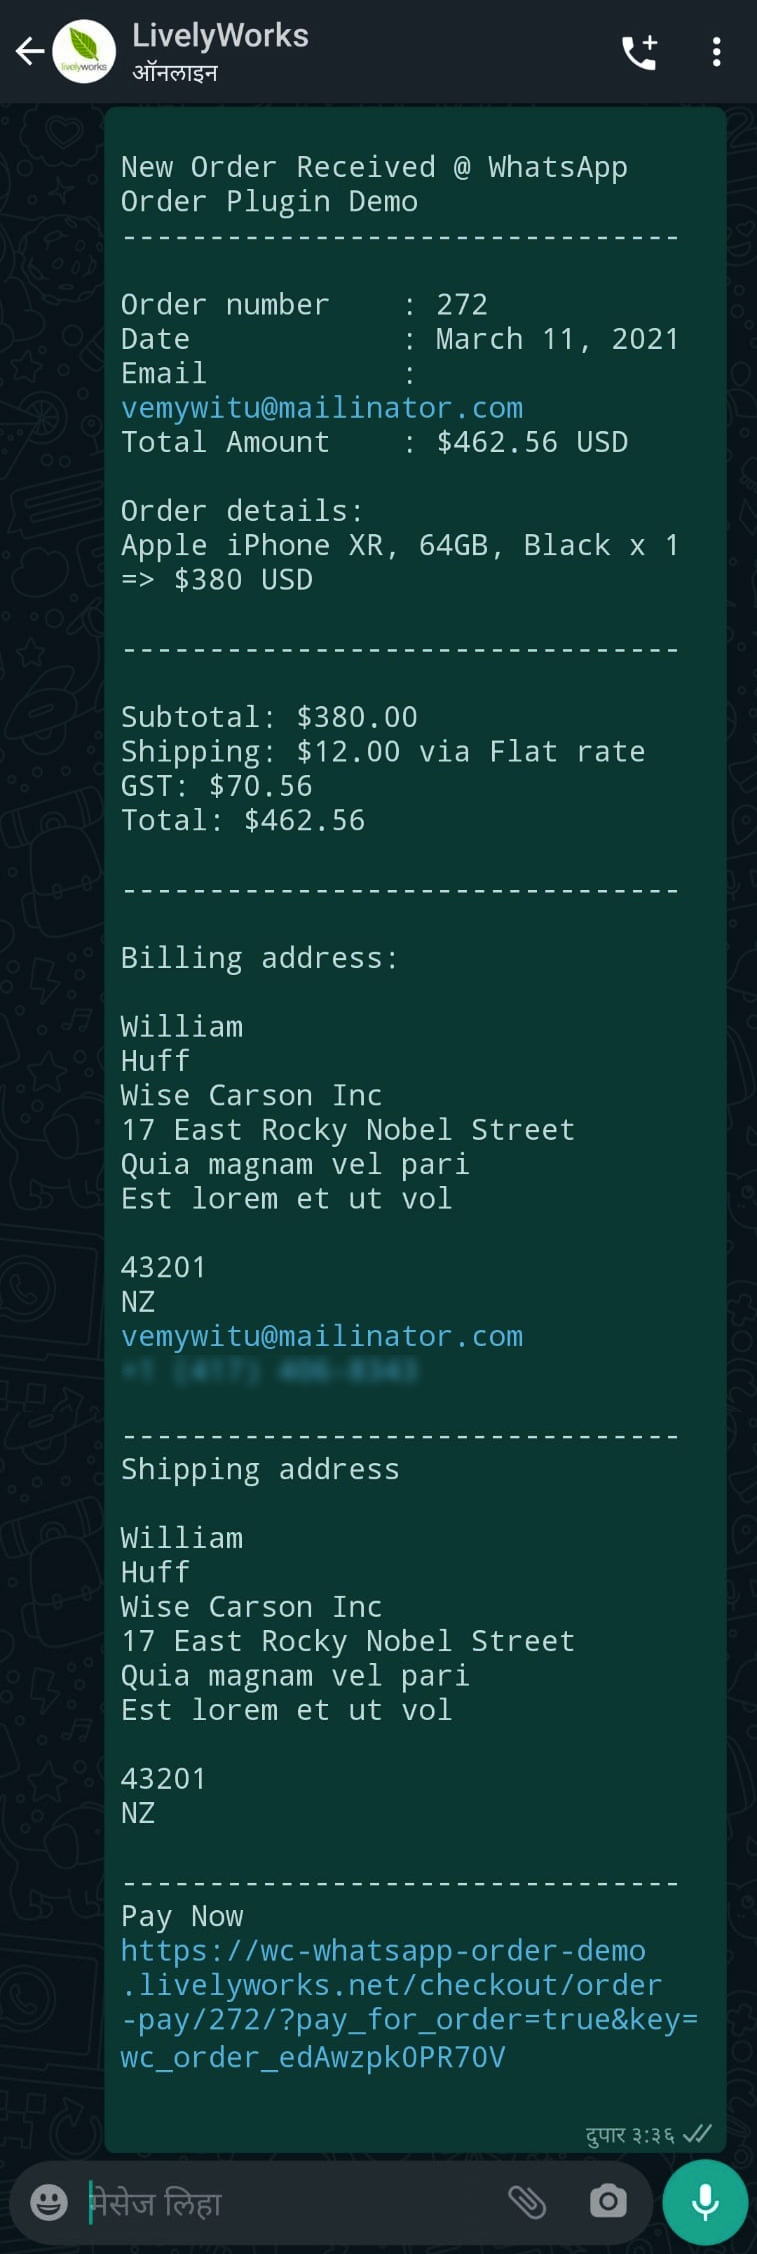 WhatsApp-Bestellung